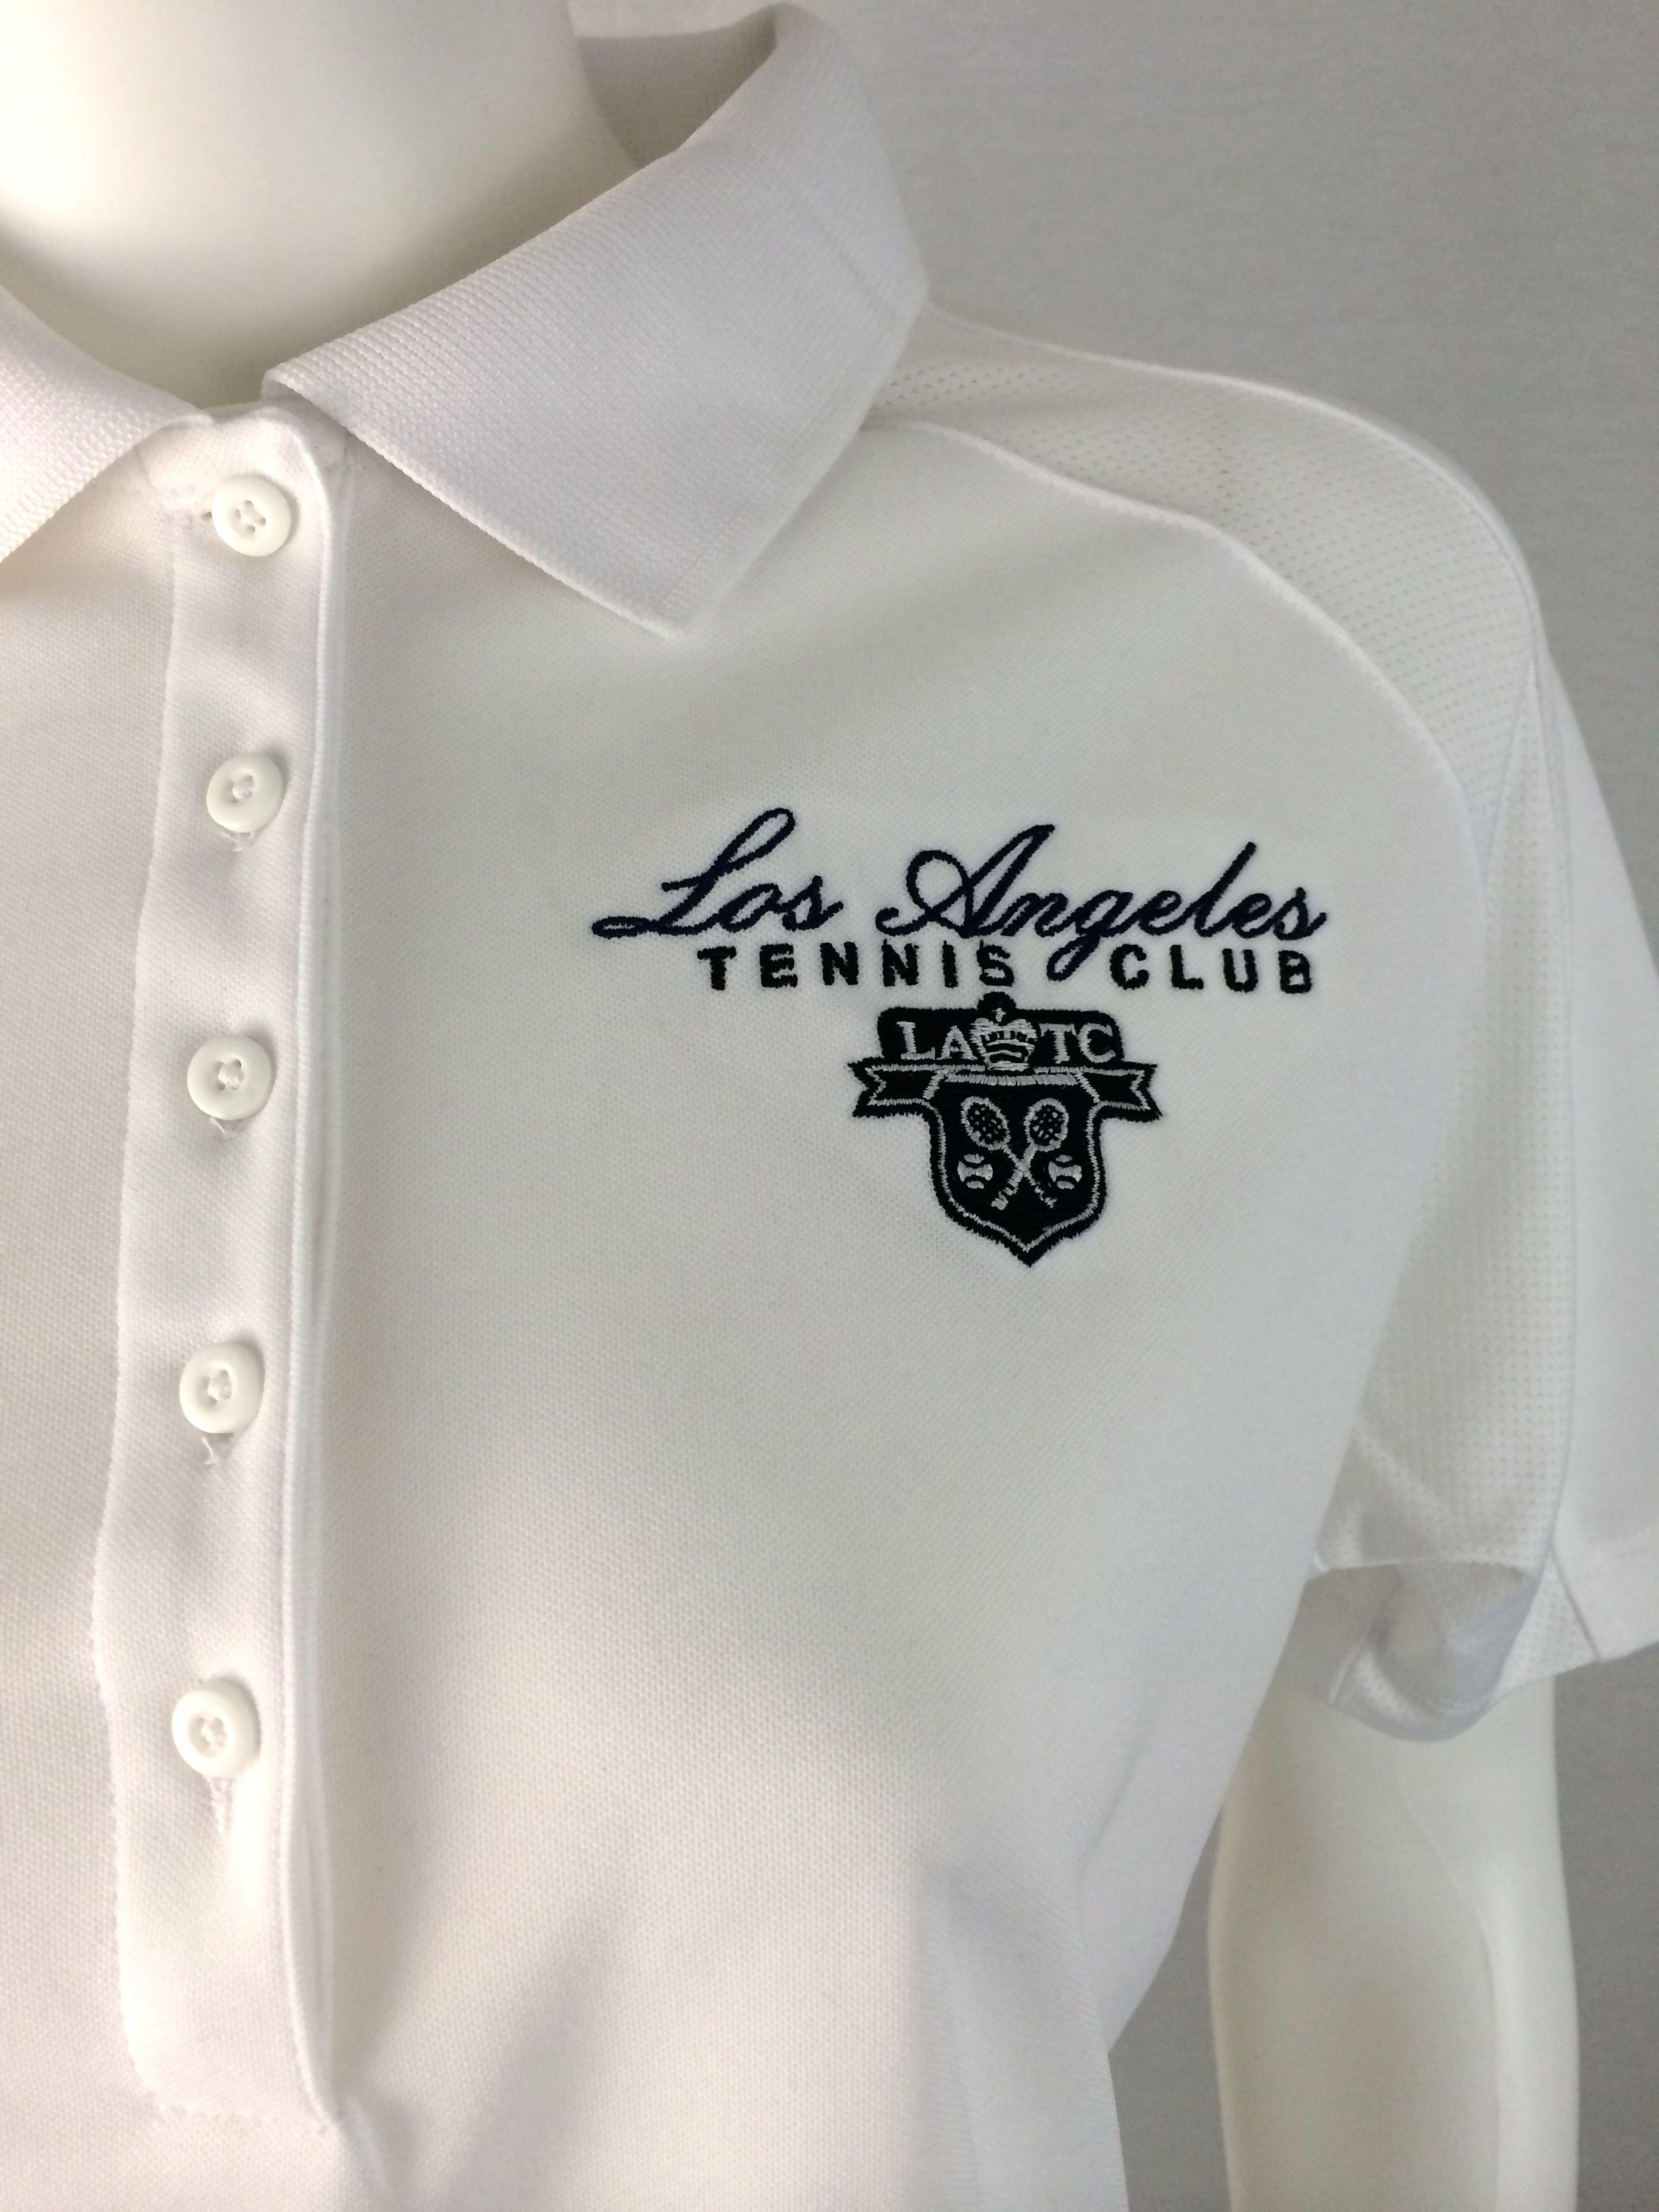 Custom Logo Polo Shirt For The Los Angeles Tennis Club The Classic